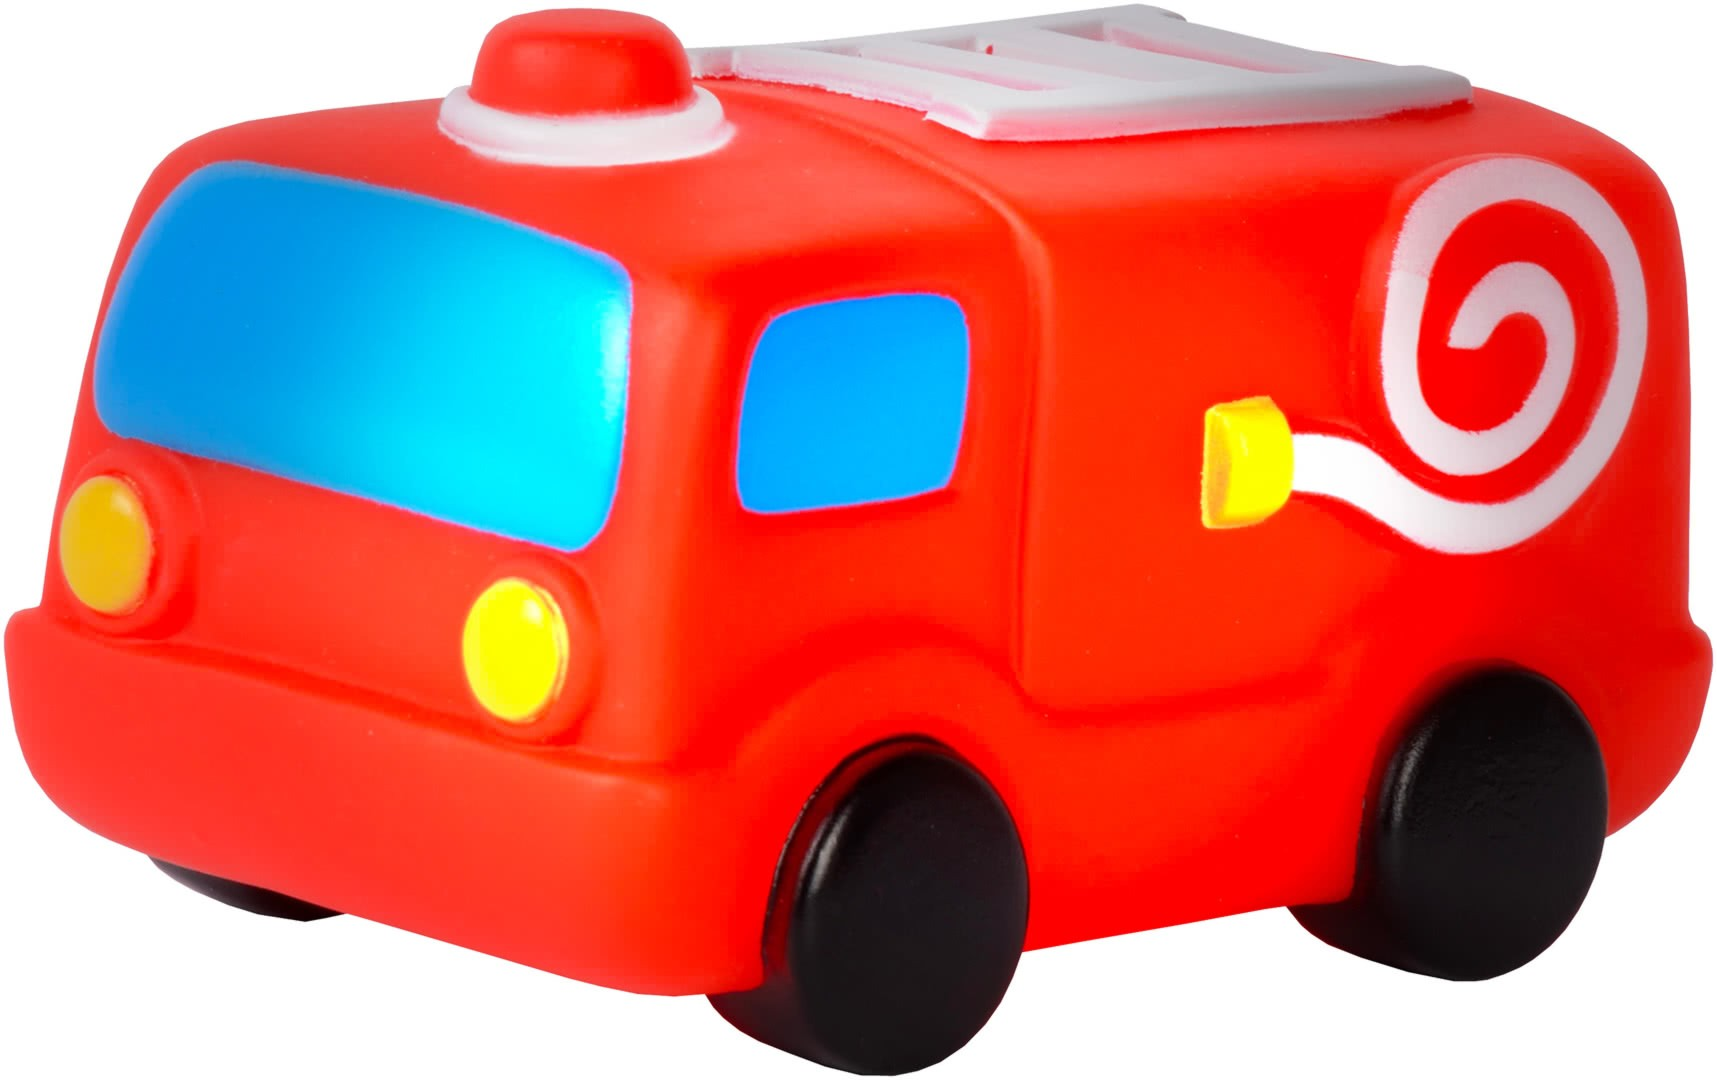 Veilleuse enfant led voiture de pompier rouge sam